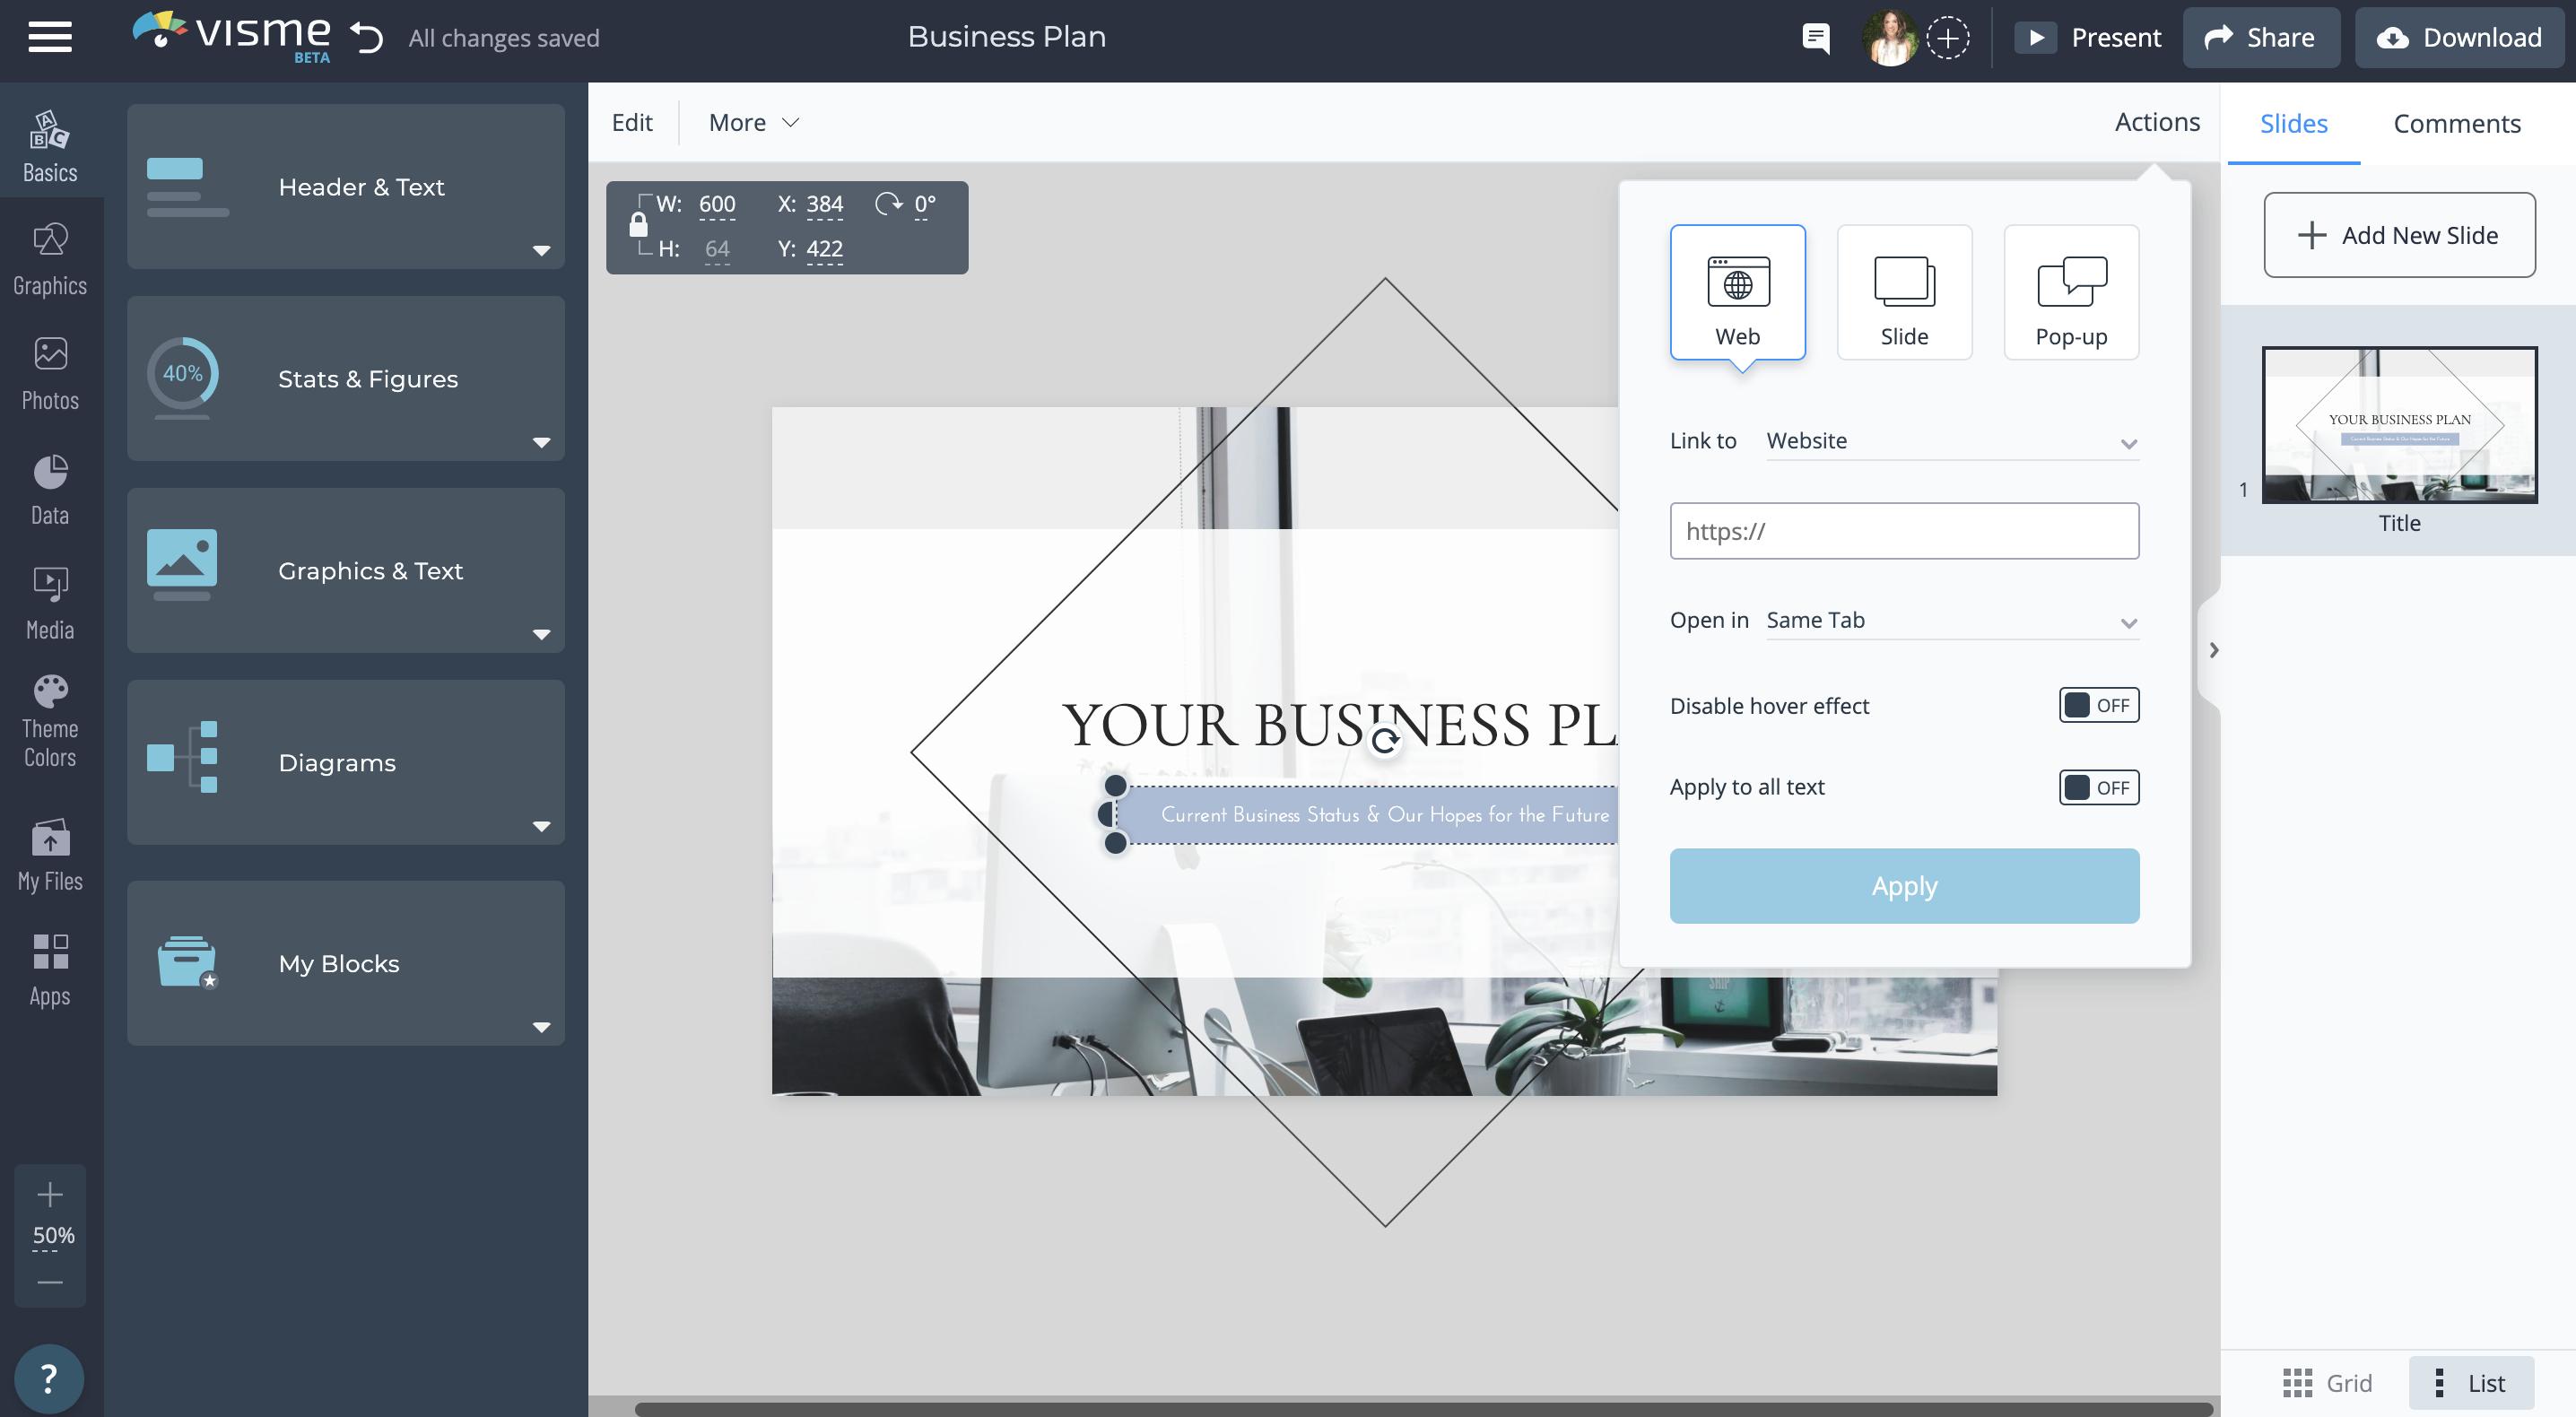 powerpoint presentation - add links in visme's dashboard